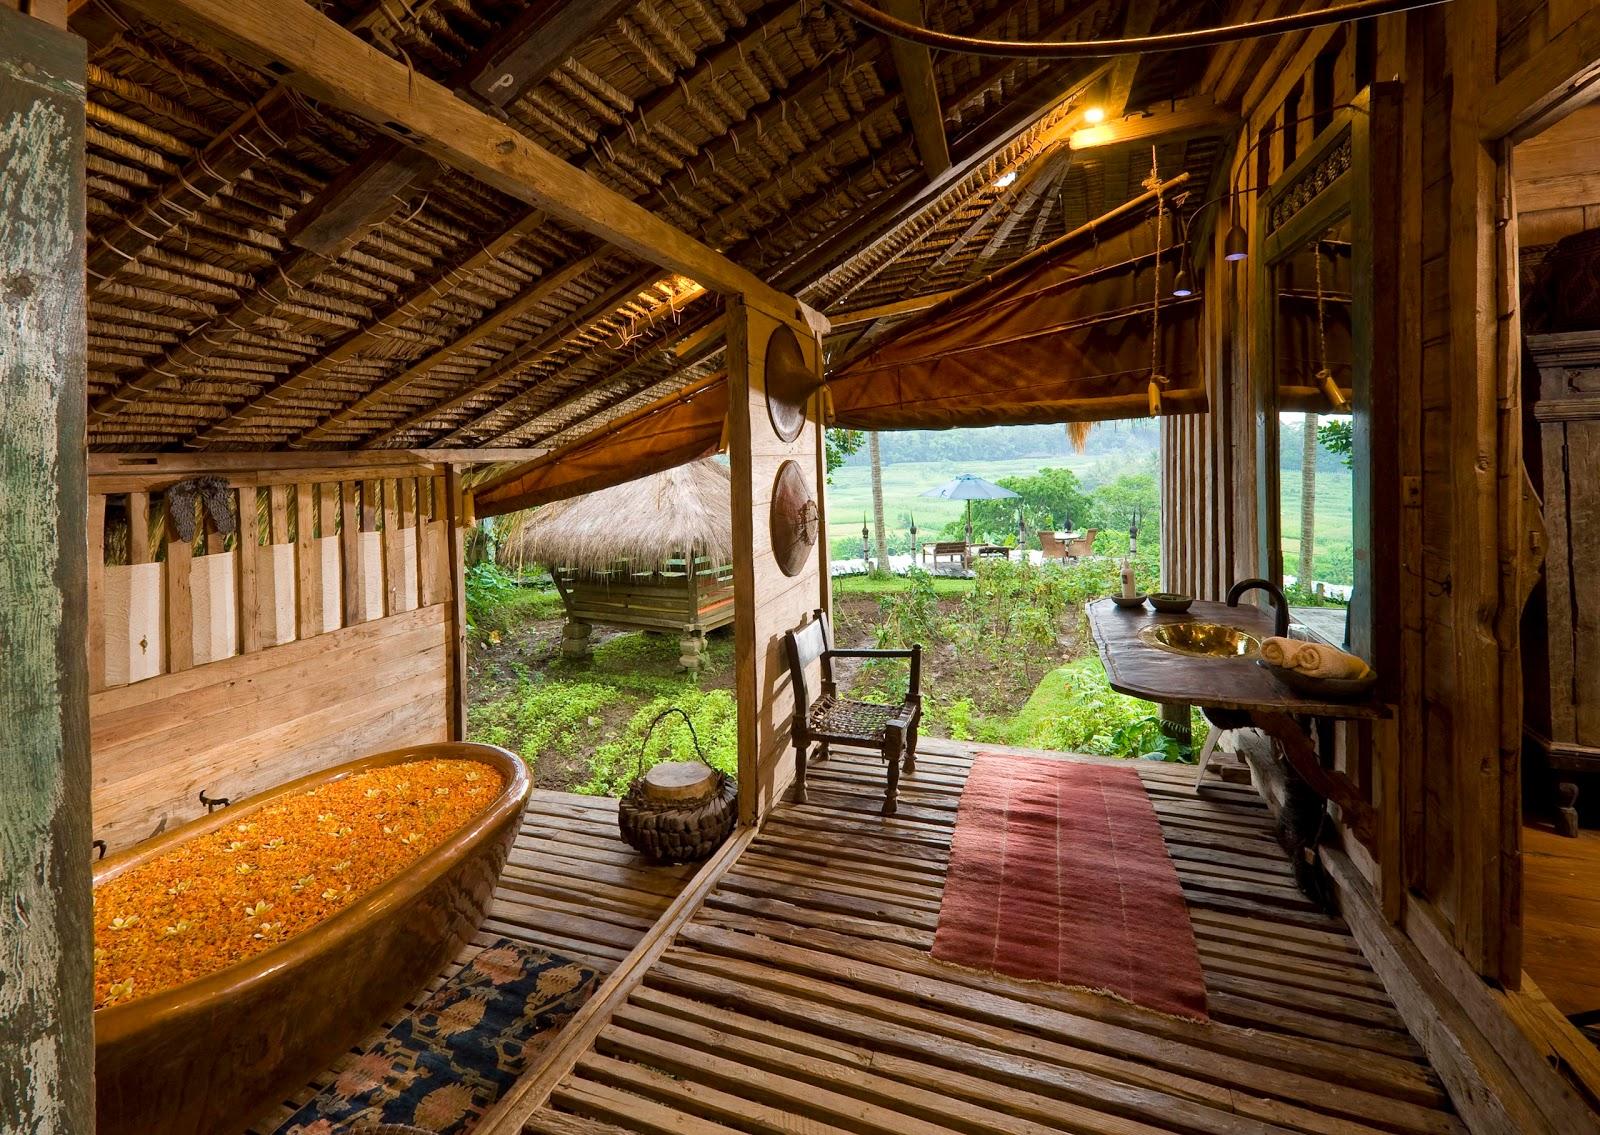 Pictures of bali a unique villa bambu indah villa for Unusual accommodation bali